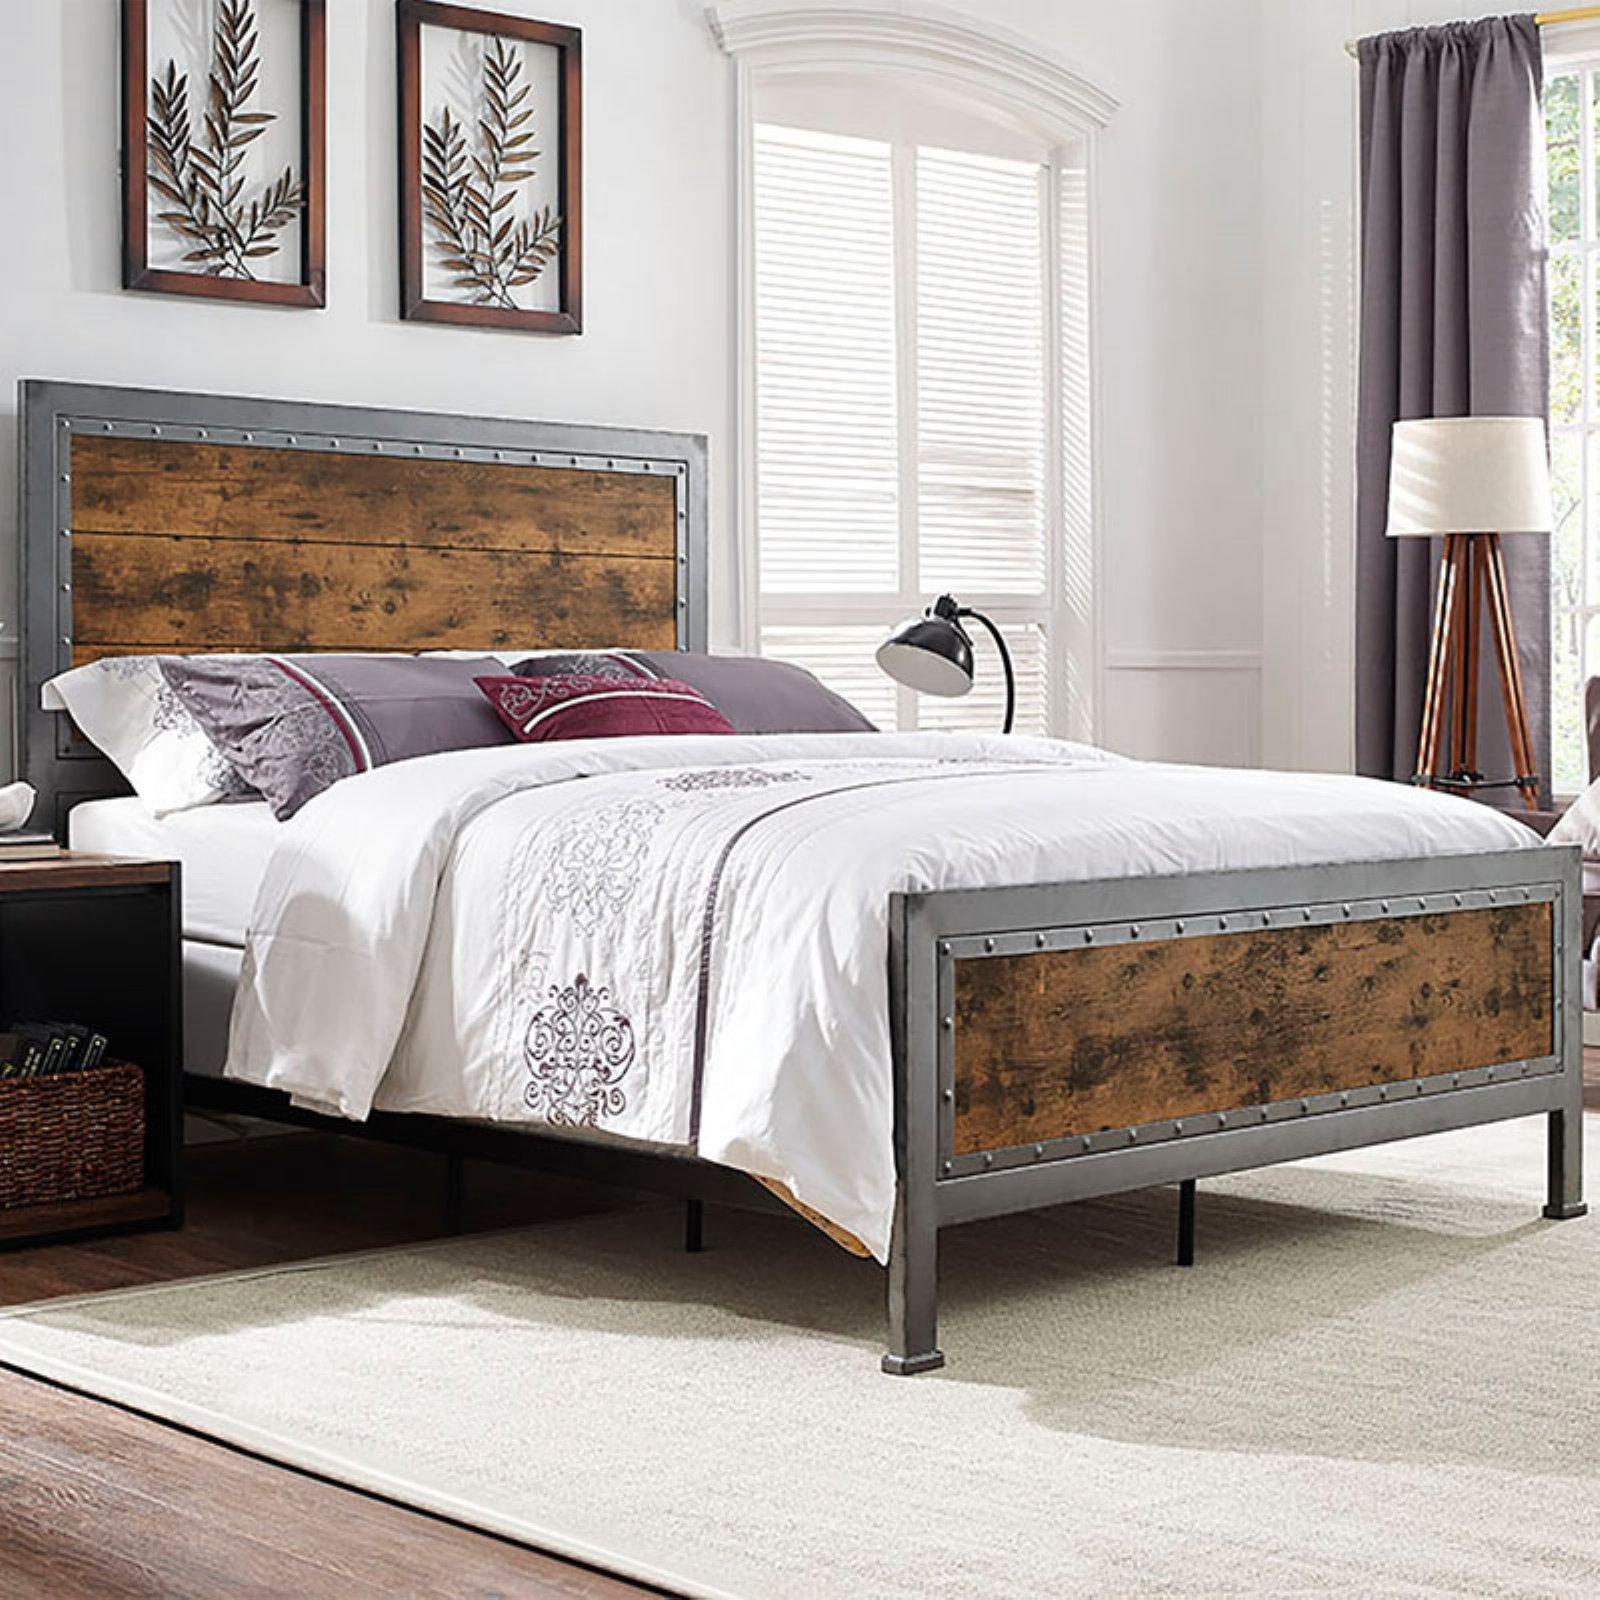 Walker Edison Queen Size Industrial Wood and Metal Bed - Brown